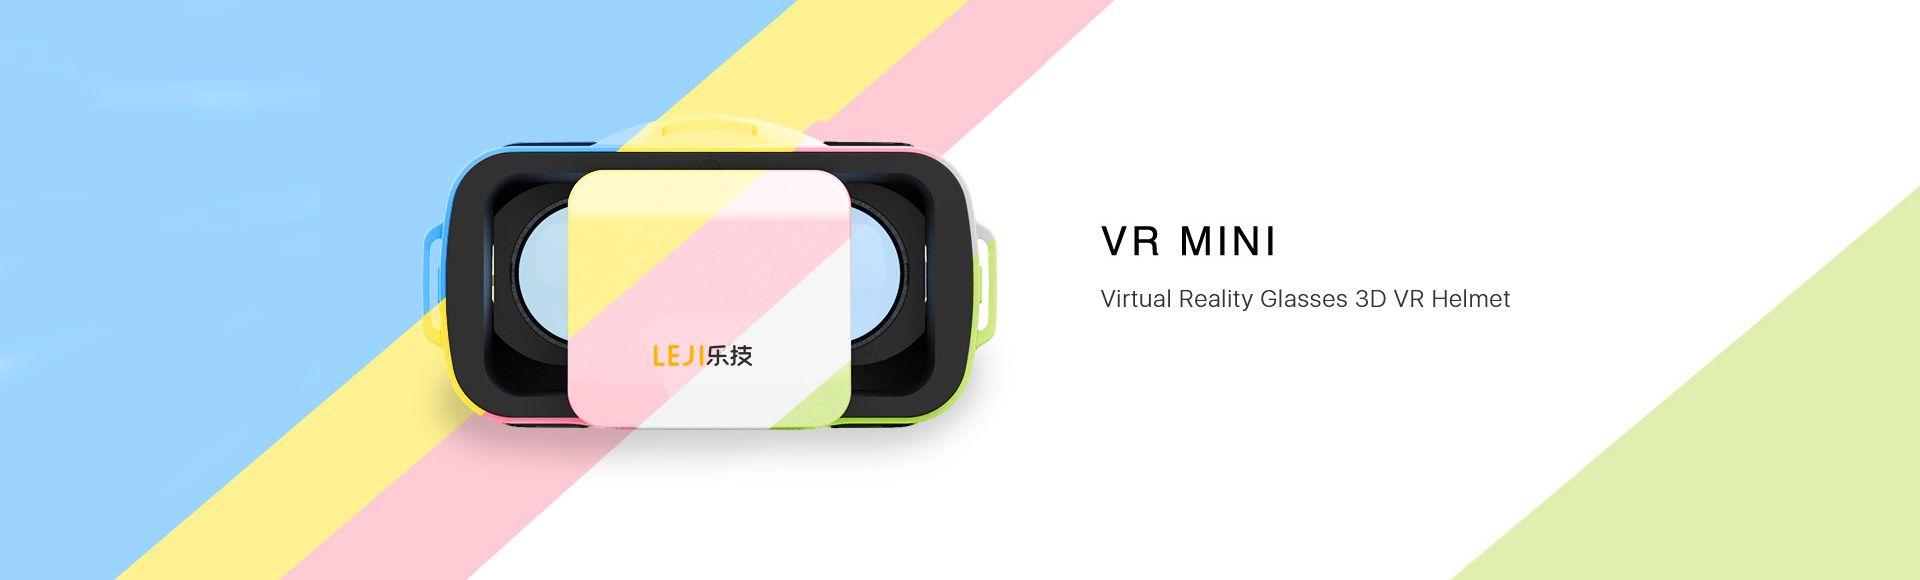 Leji Mini VR Box Virtual Reality Glasses 3D - VR helmet cardboard, Virtual reality gaming headset, For 4.7- 5.5 inches smartphones